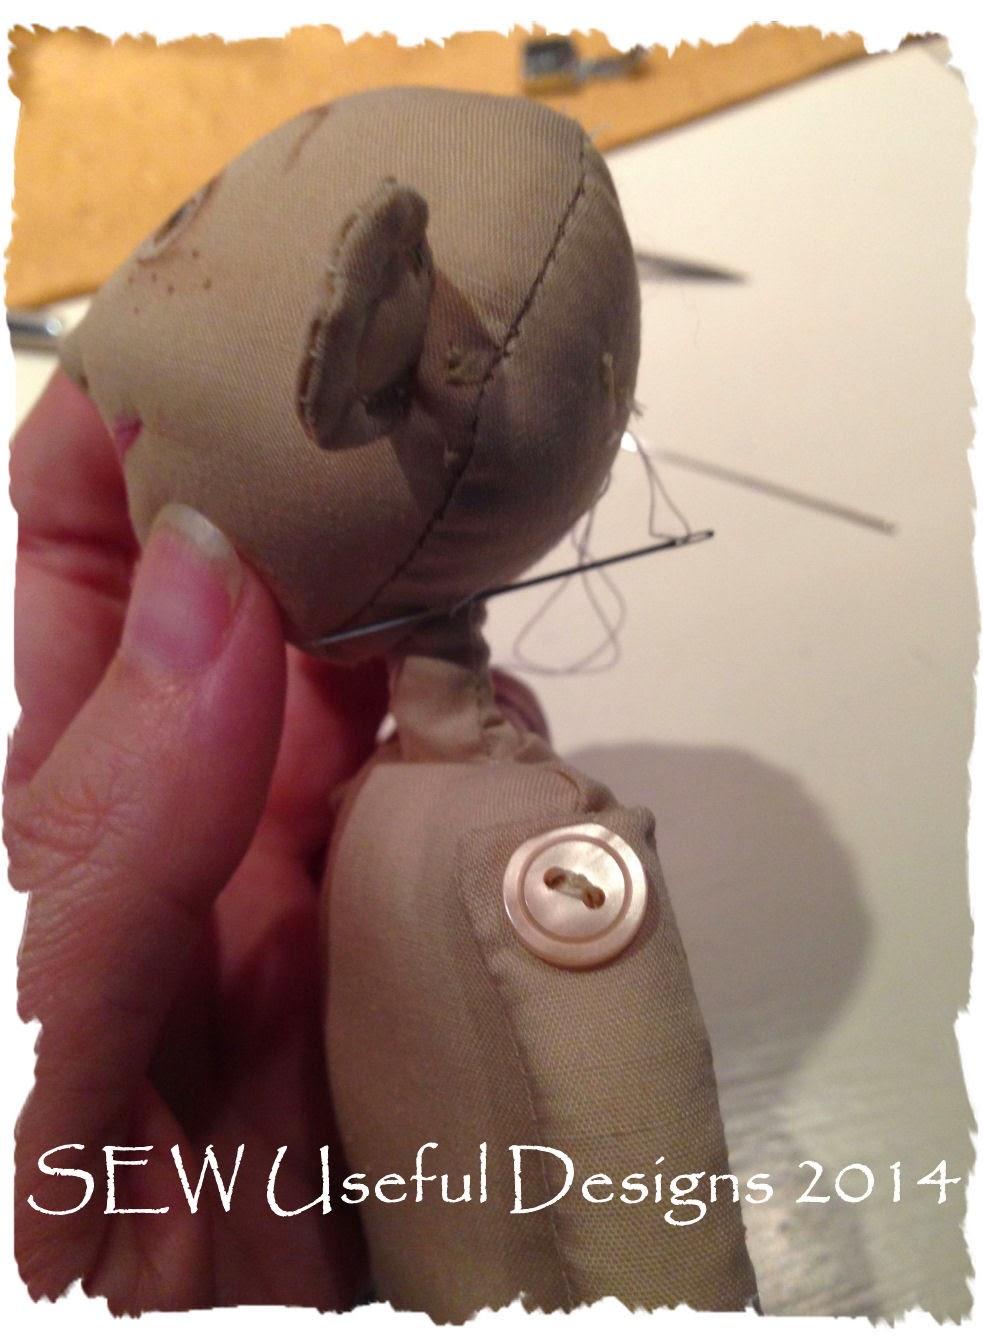 Sew Useful Designs September 2014